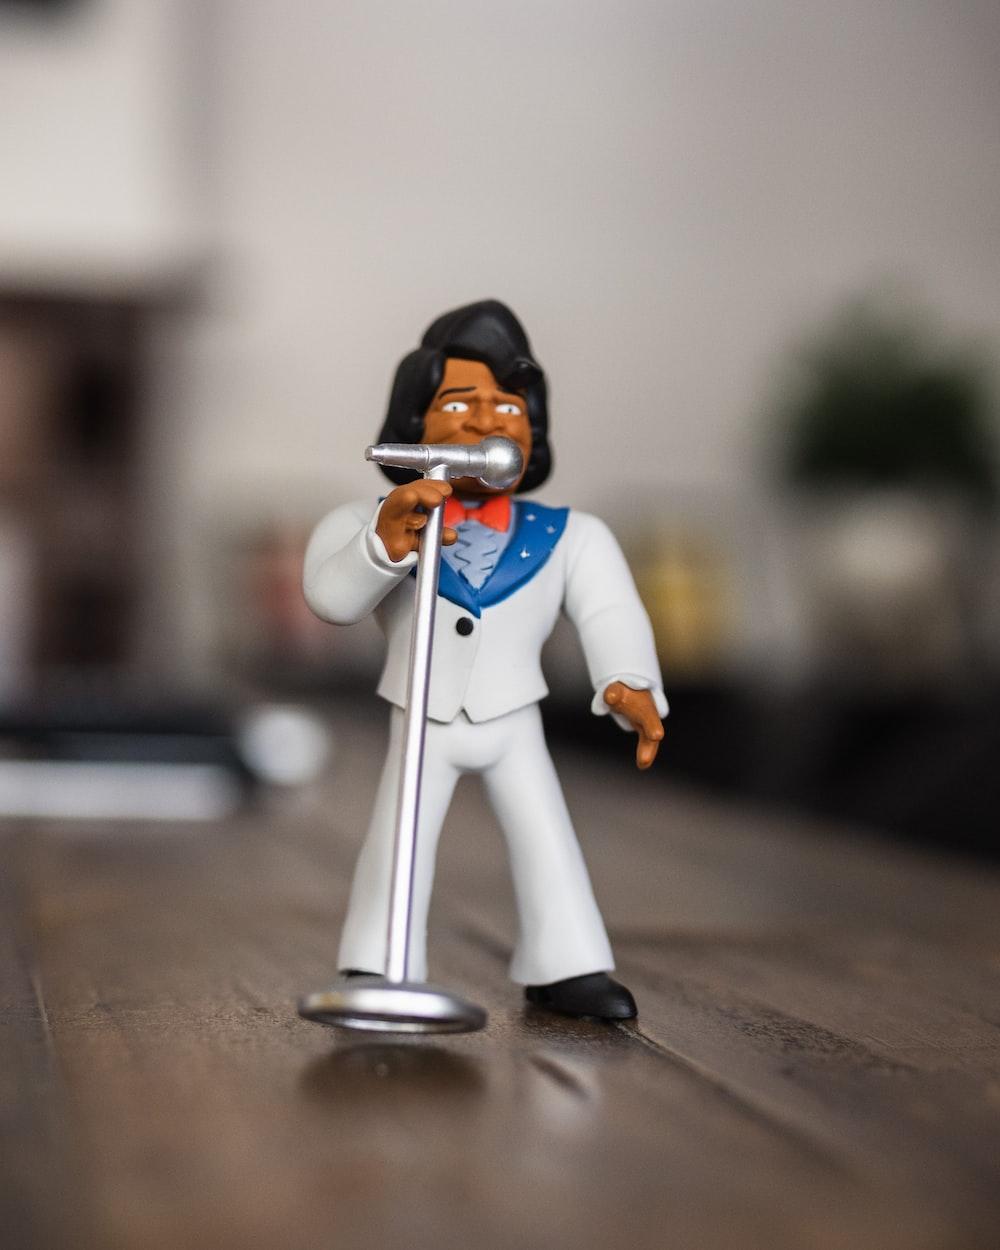 man singing figurine on selective focus photography